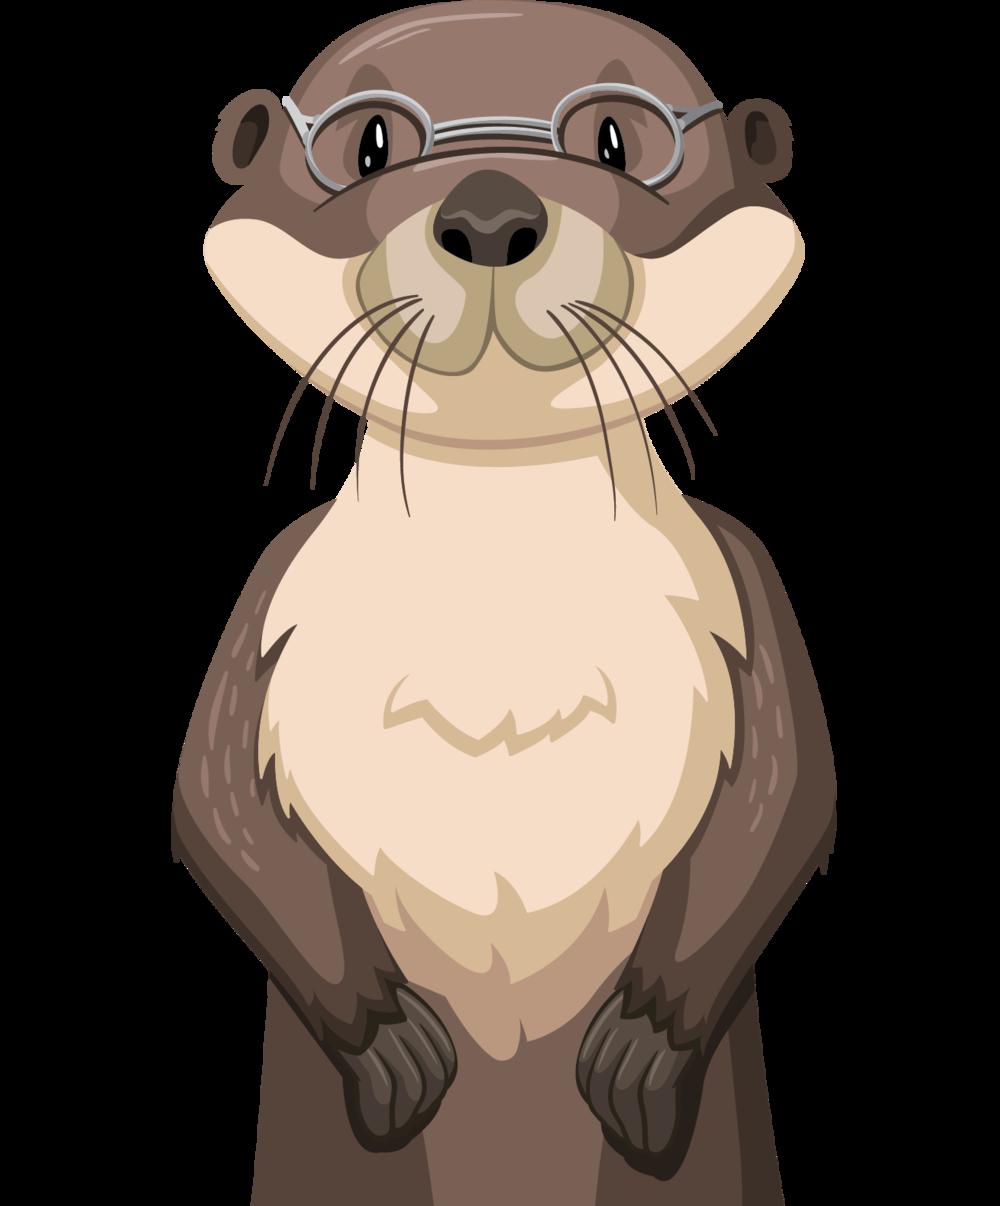 SAM_Otter Headshot copy.png